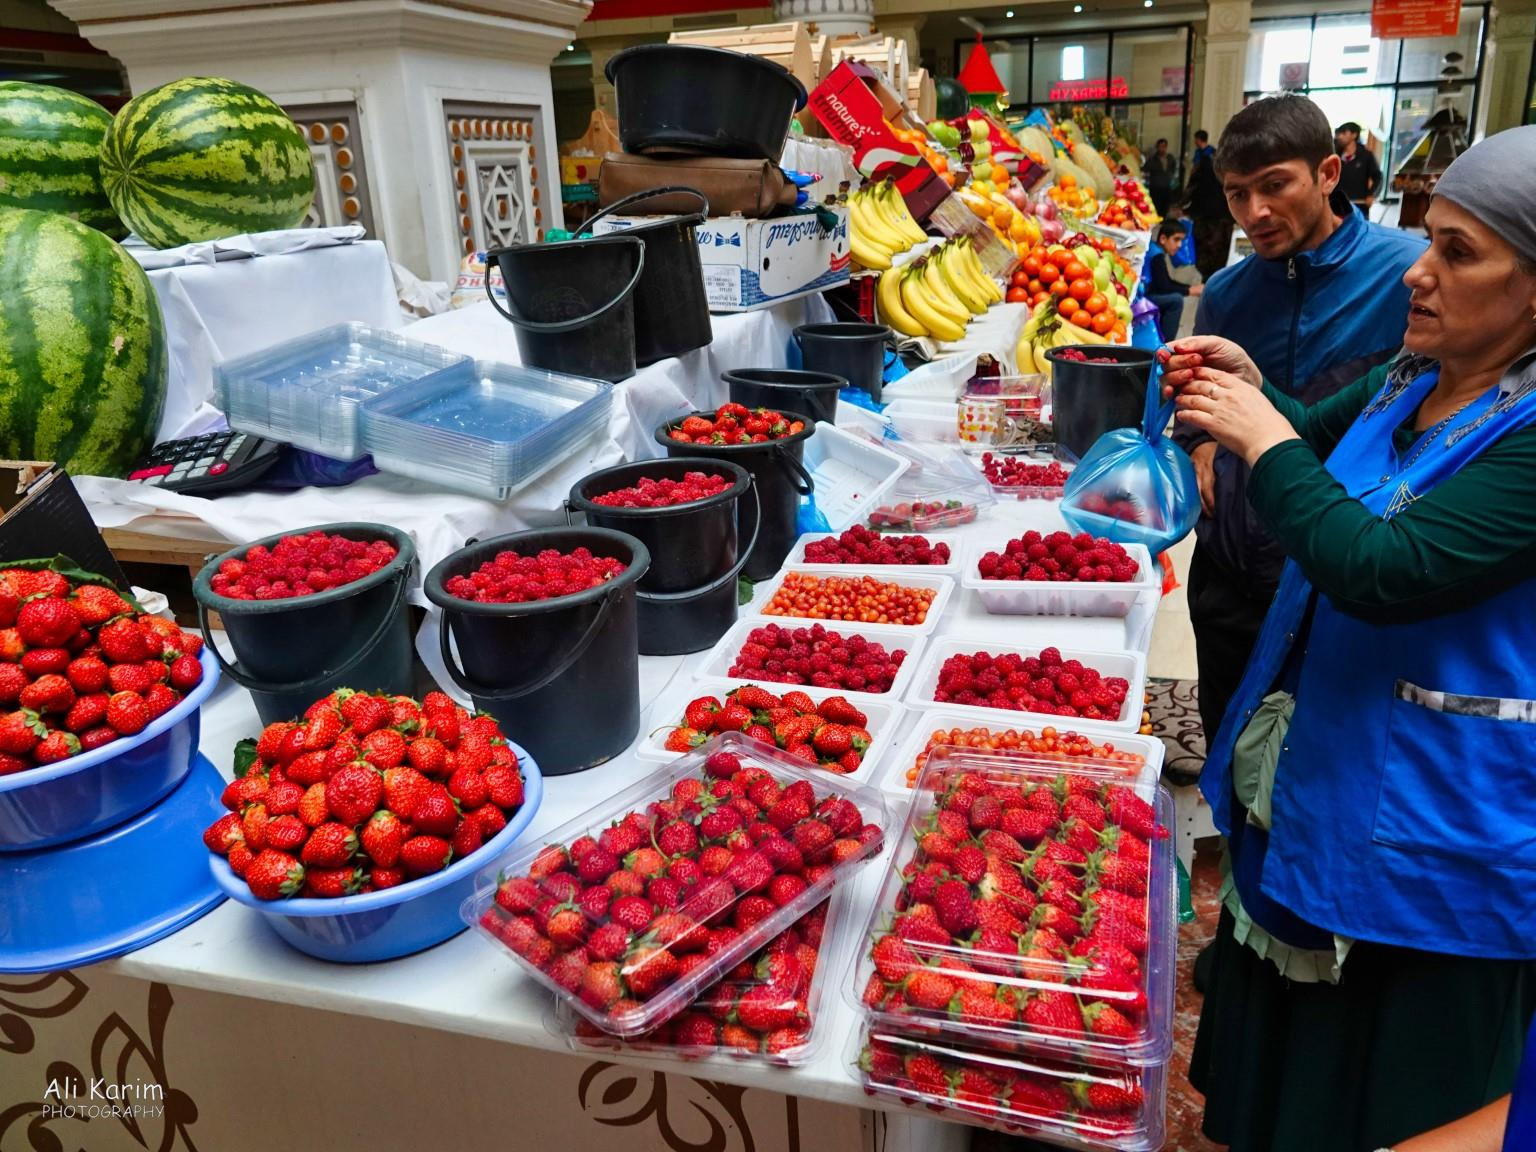 More Dushanbe, Tajikistan Fresh strawberries